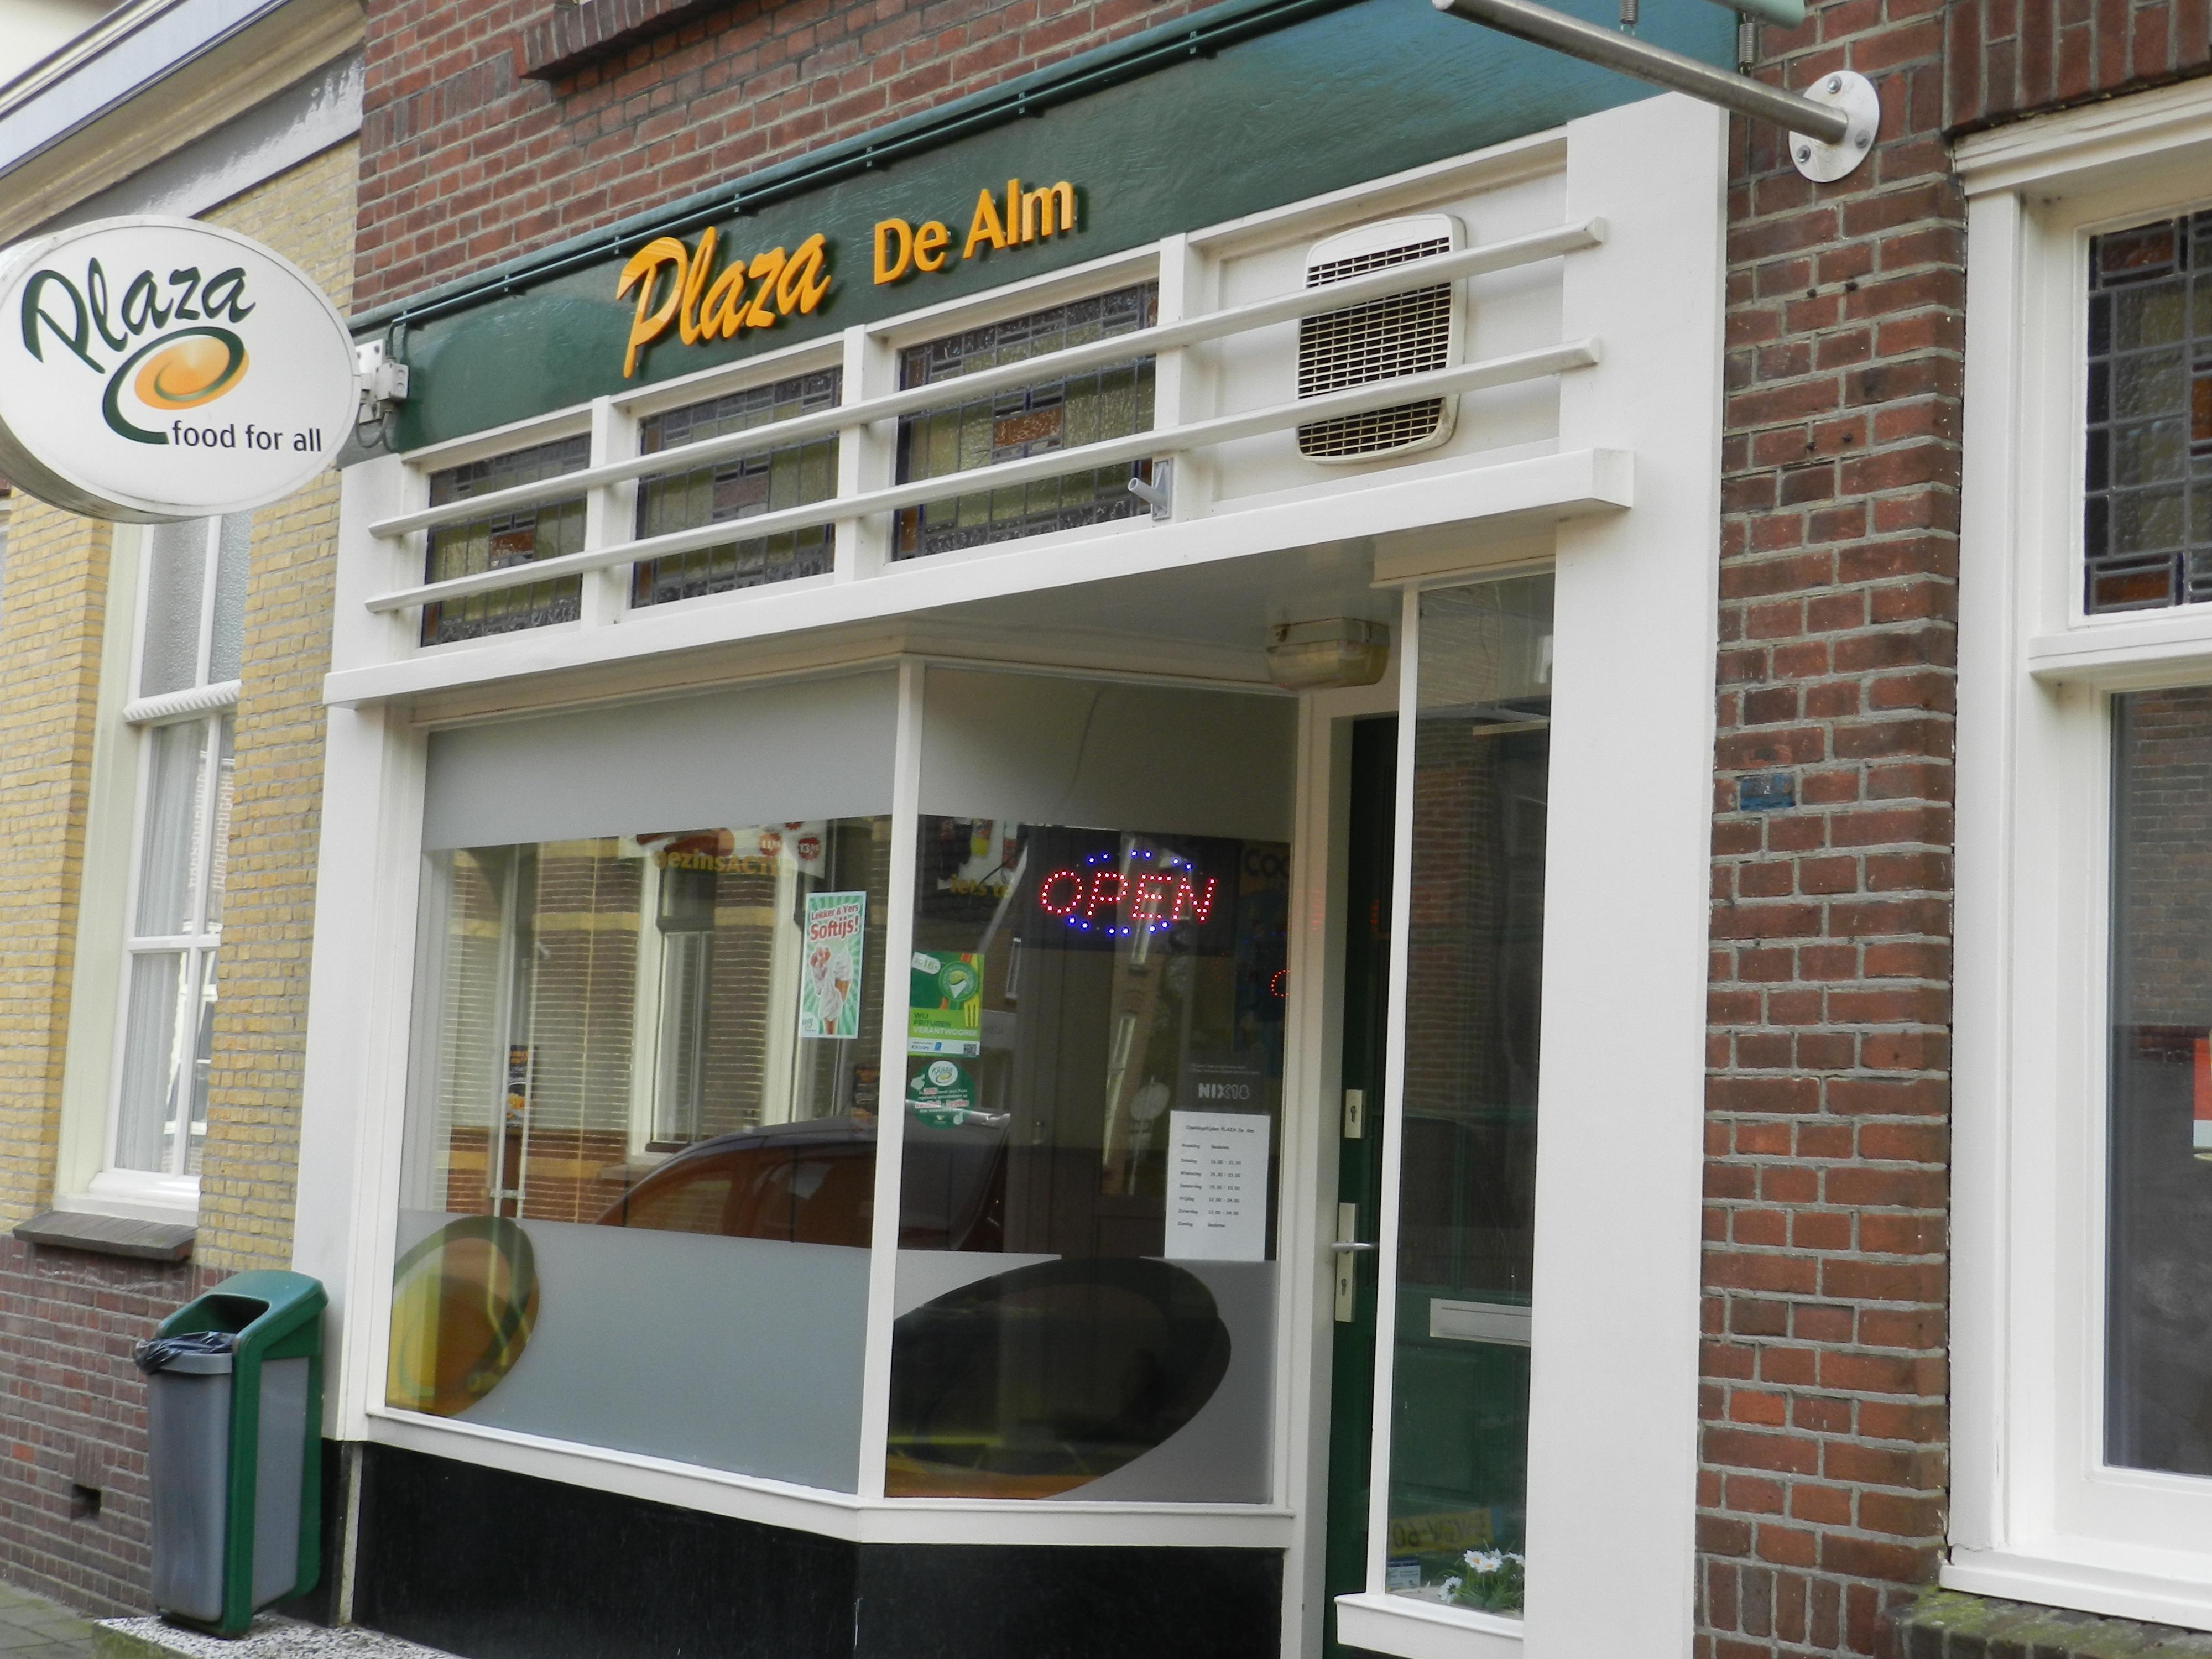 plaza de alm eetcafe almkerk 1 Home